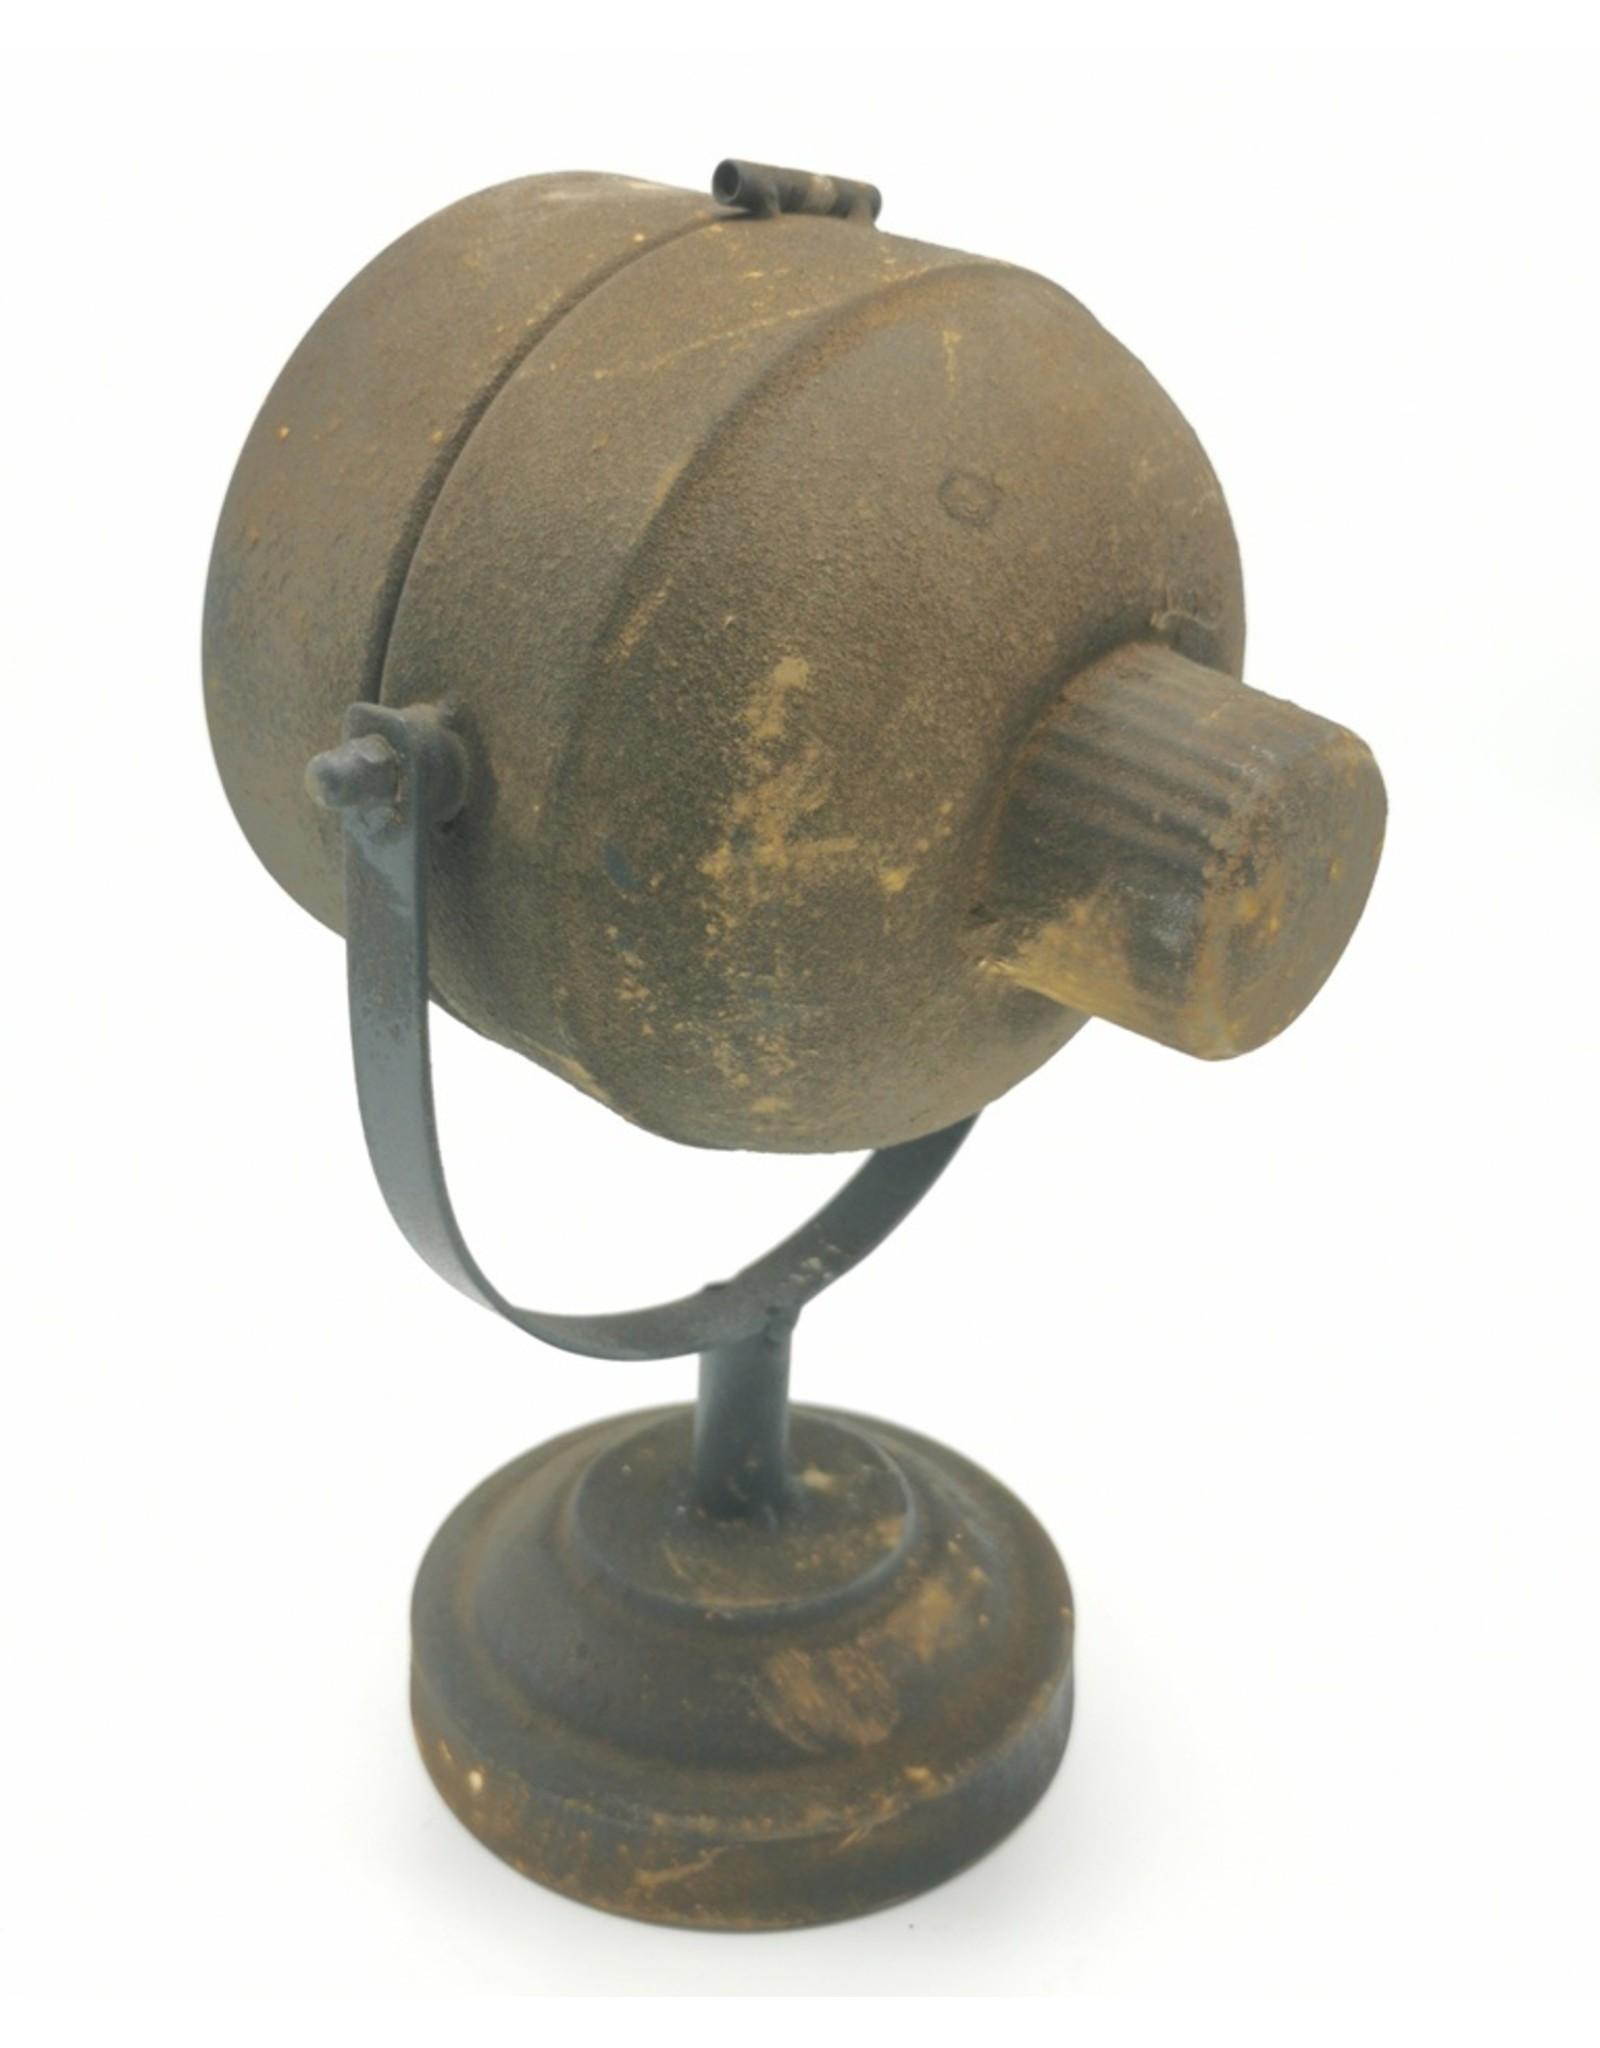 Trukado Miscellaneous - Klok Koplamp Roestbruin Metaal, Industriele look